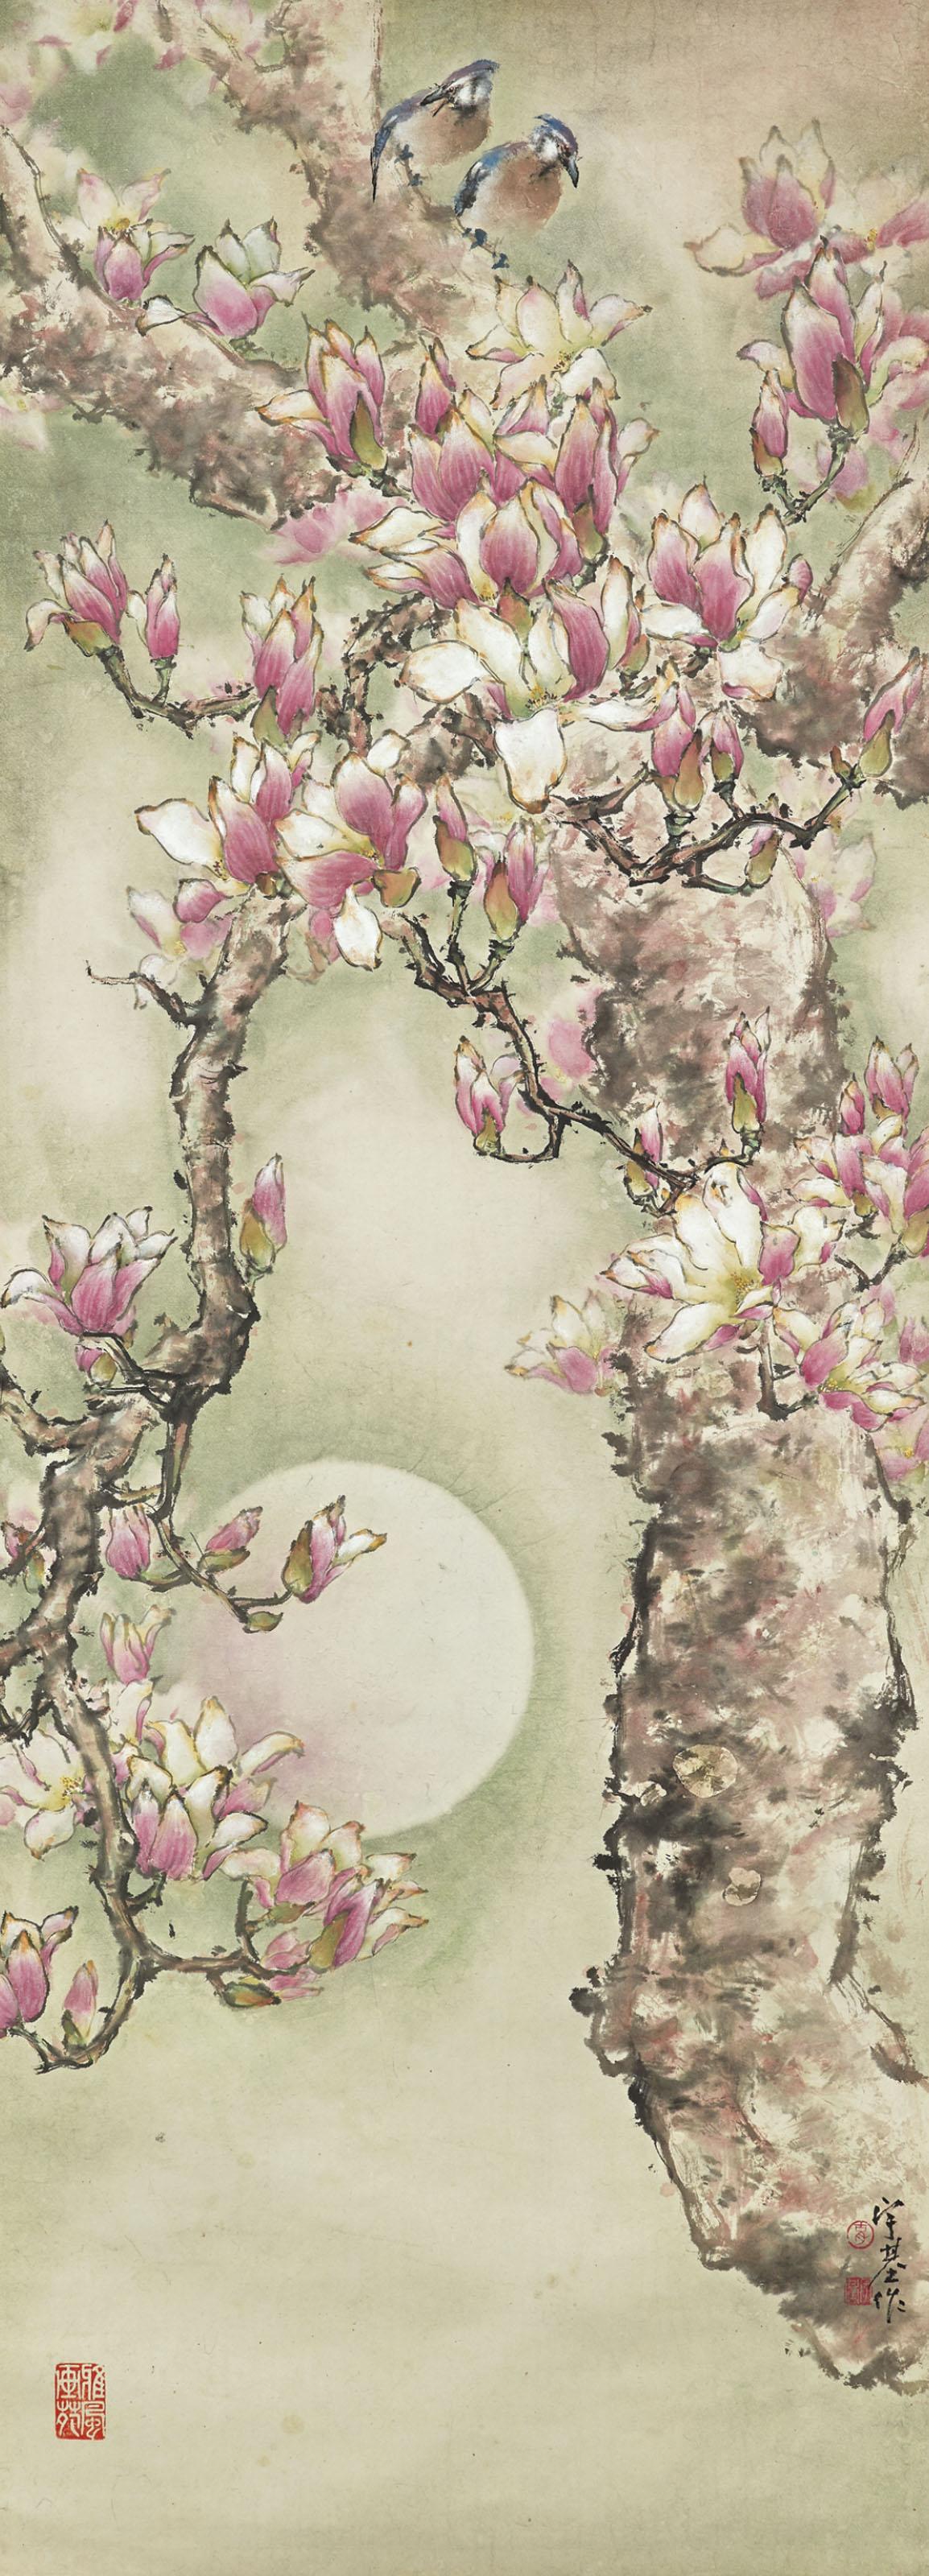 Welcoming Spring